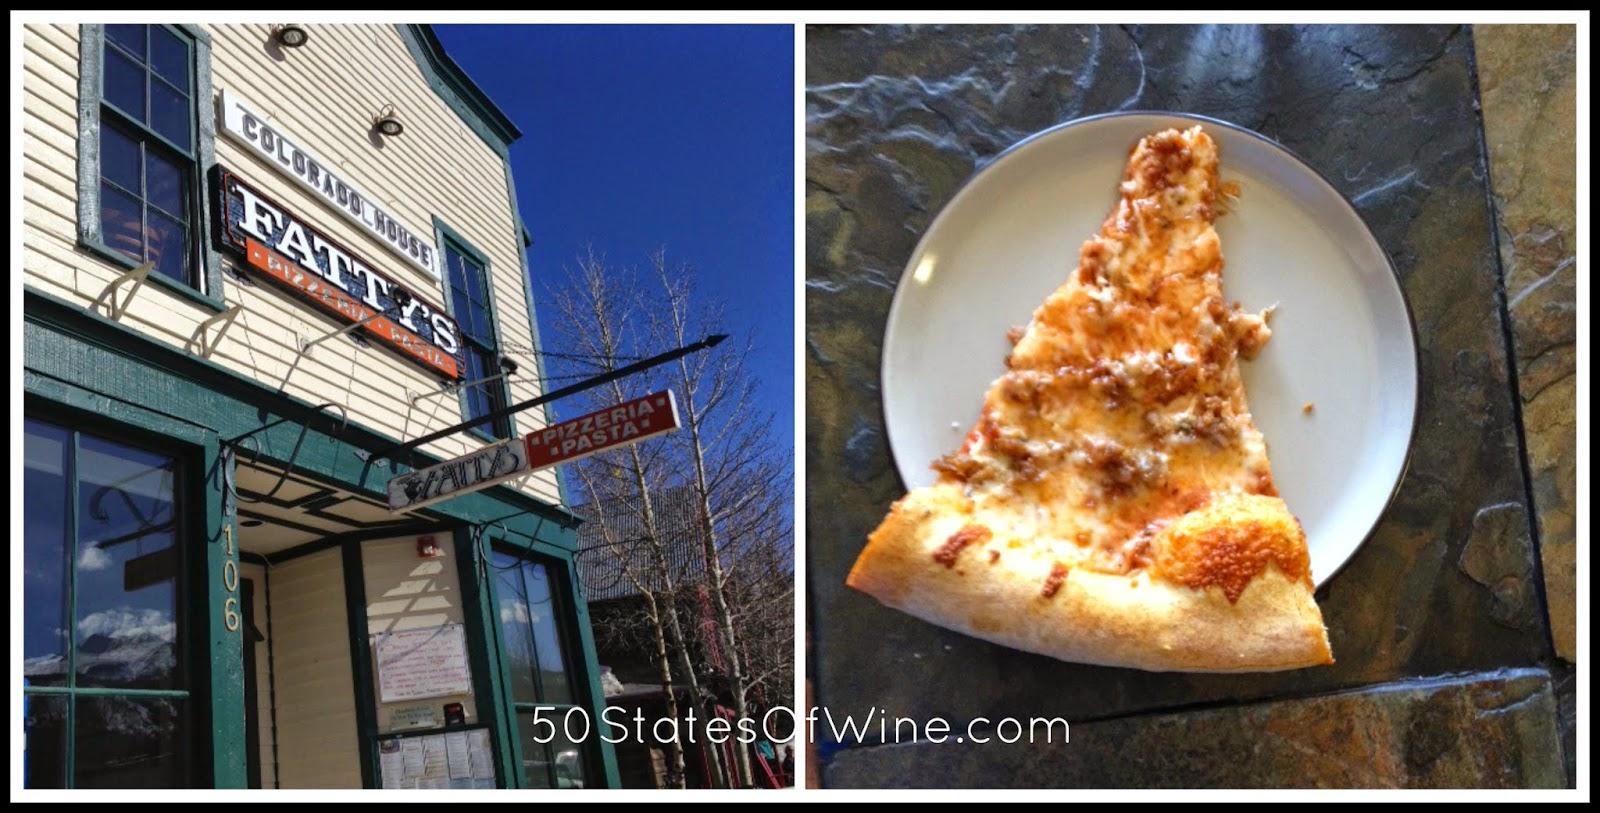 Restaurants in Breckenridge Fatty's Pizzeria